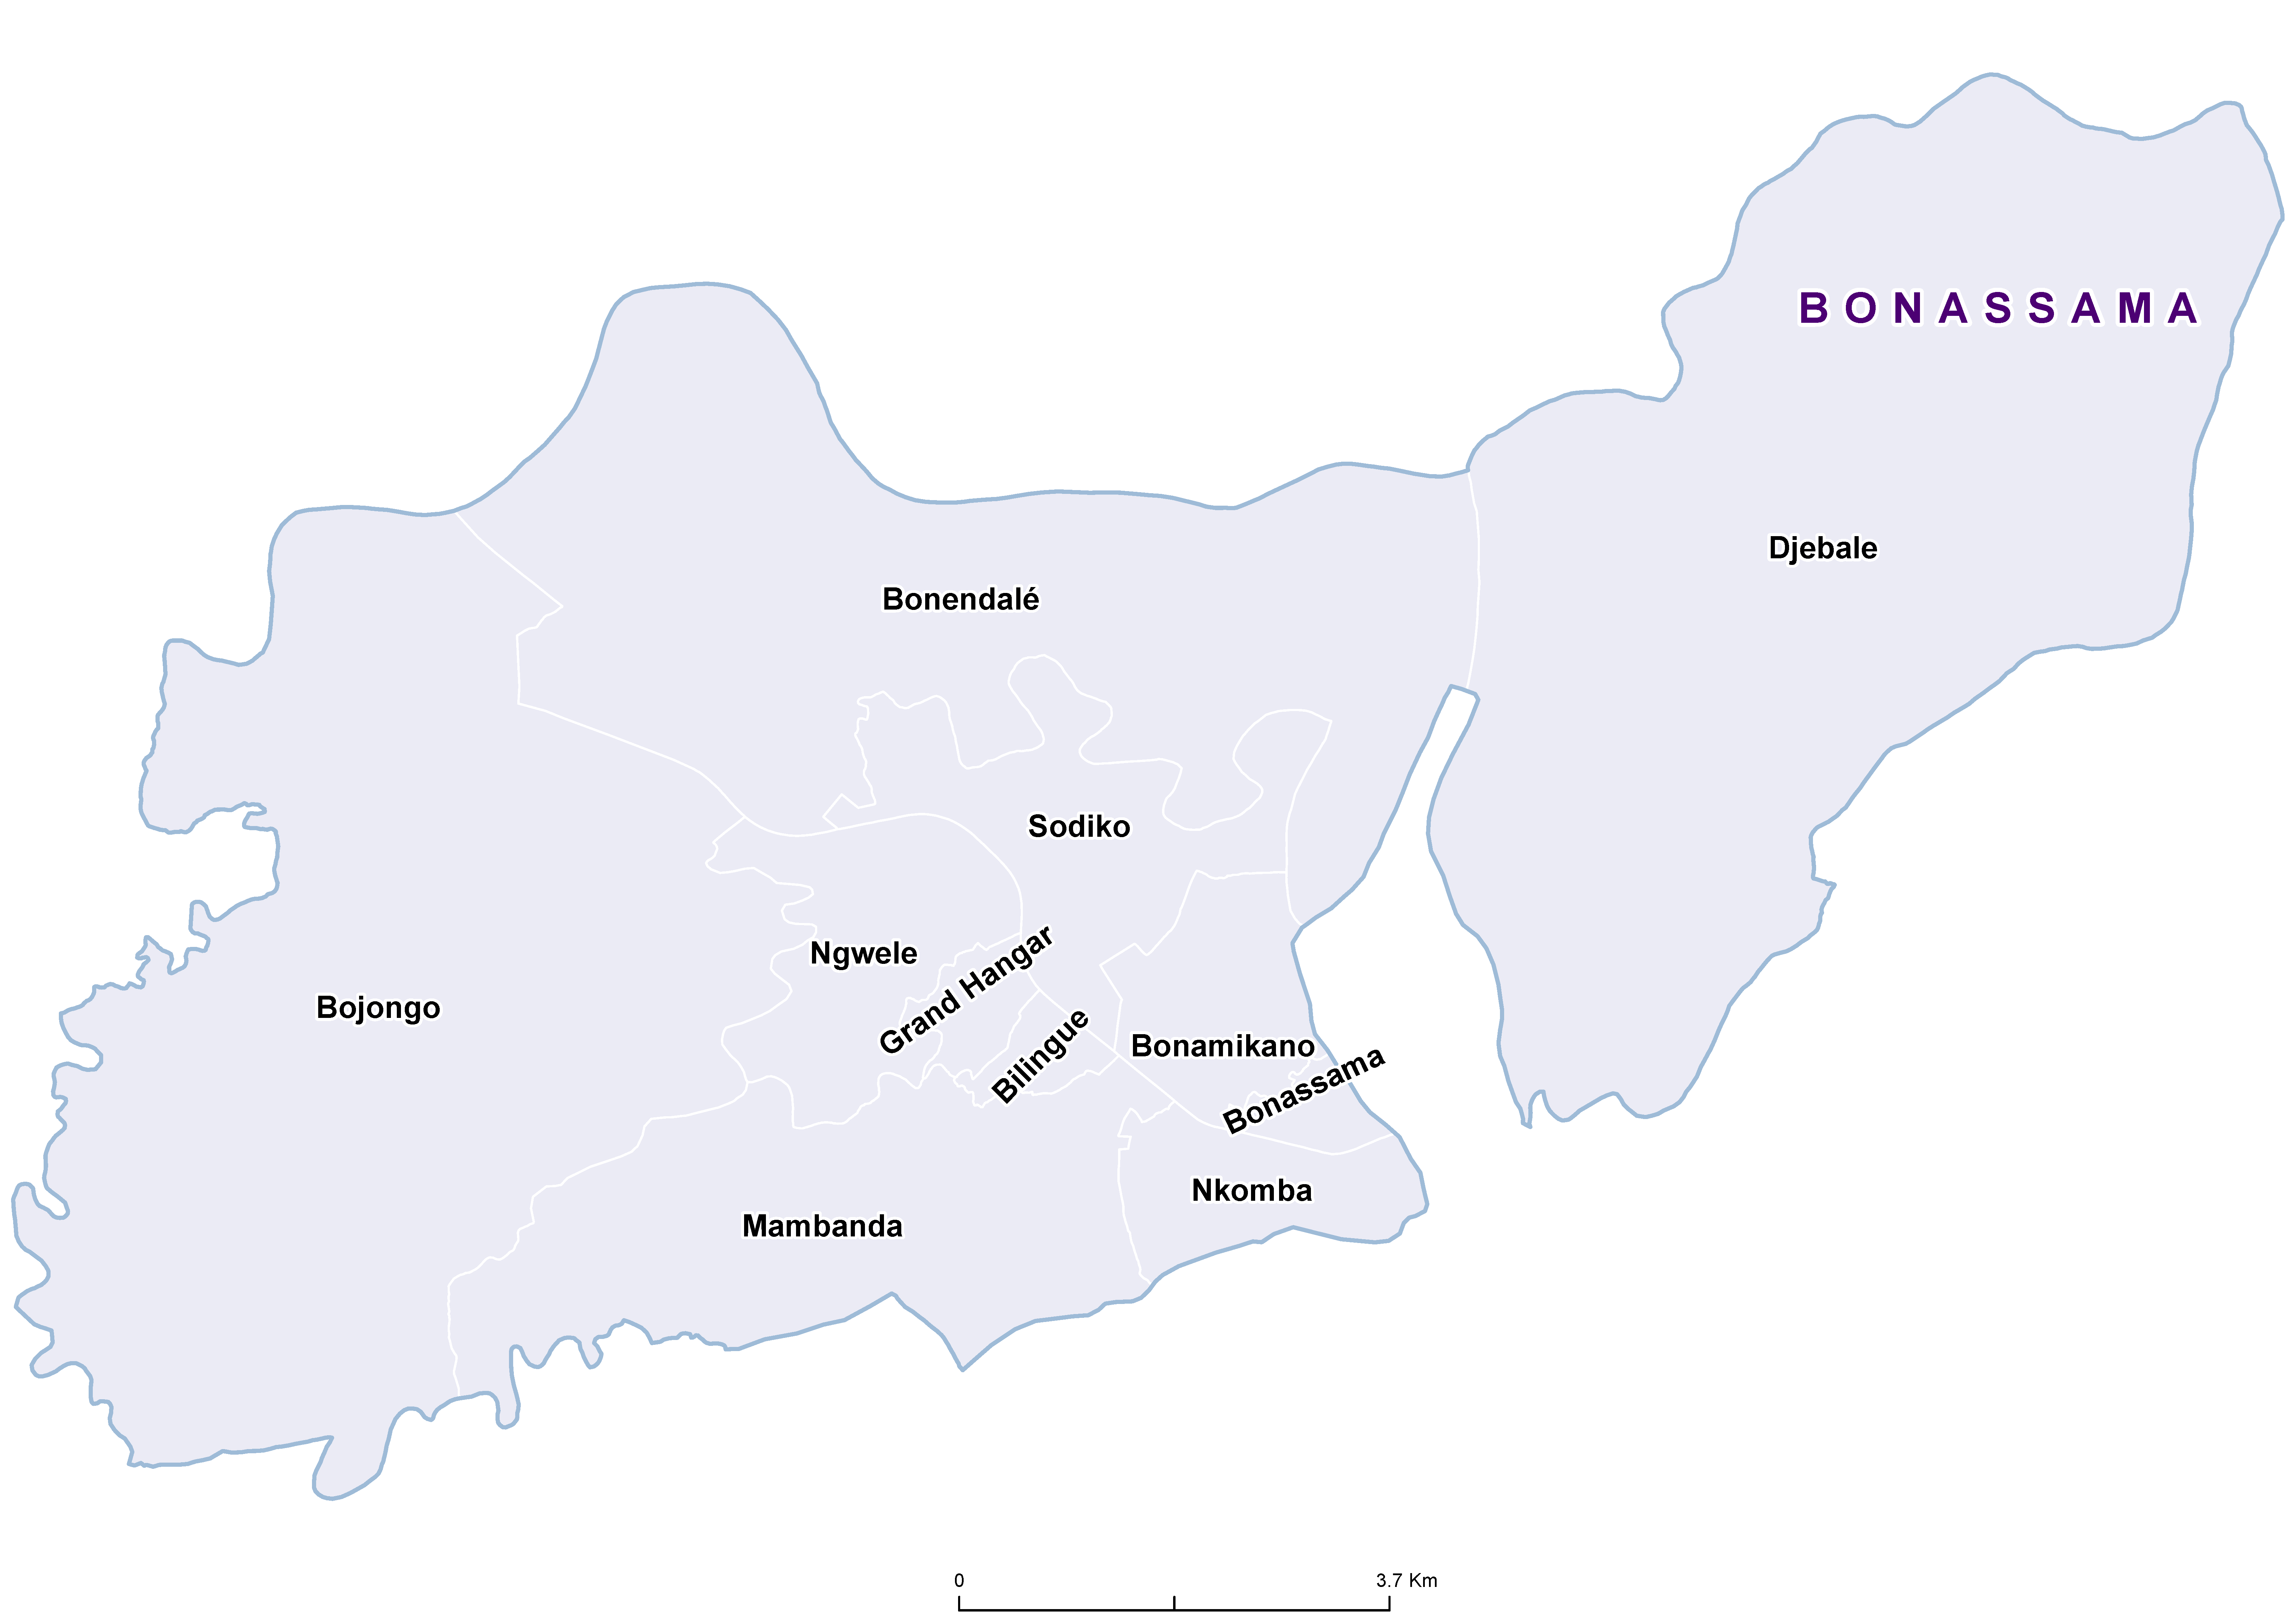 Bonassama STH 20100001